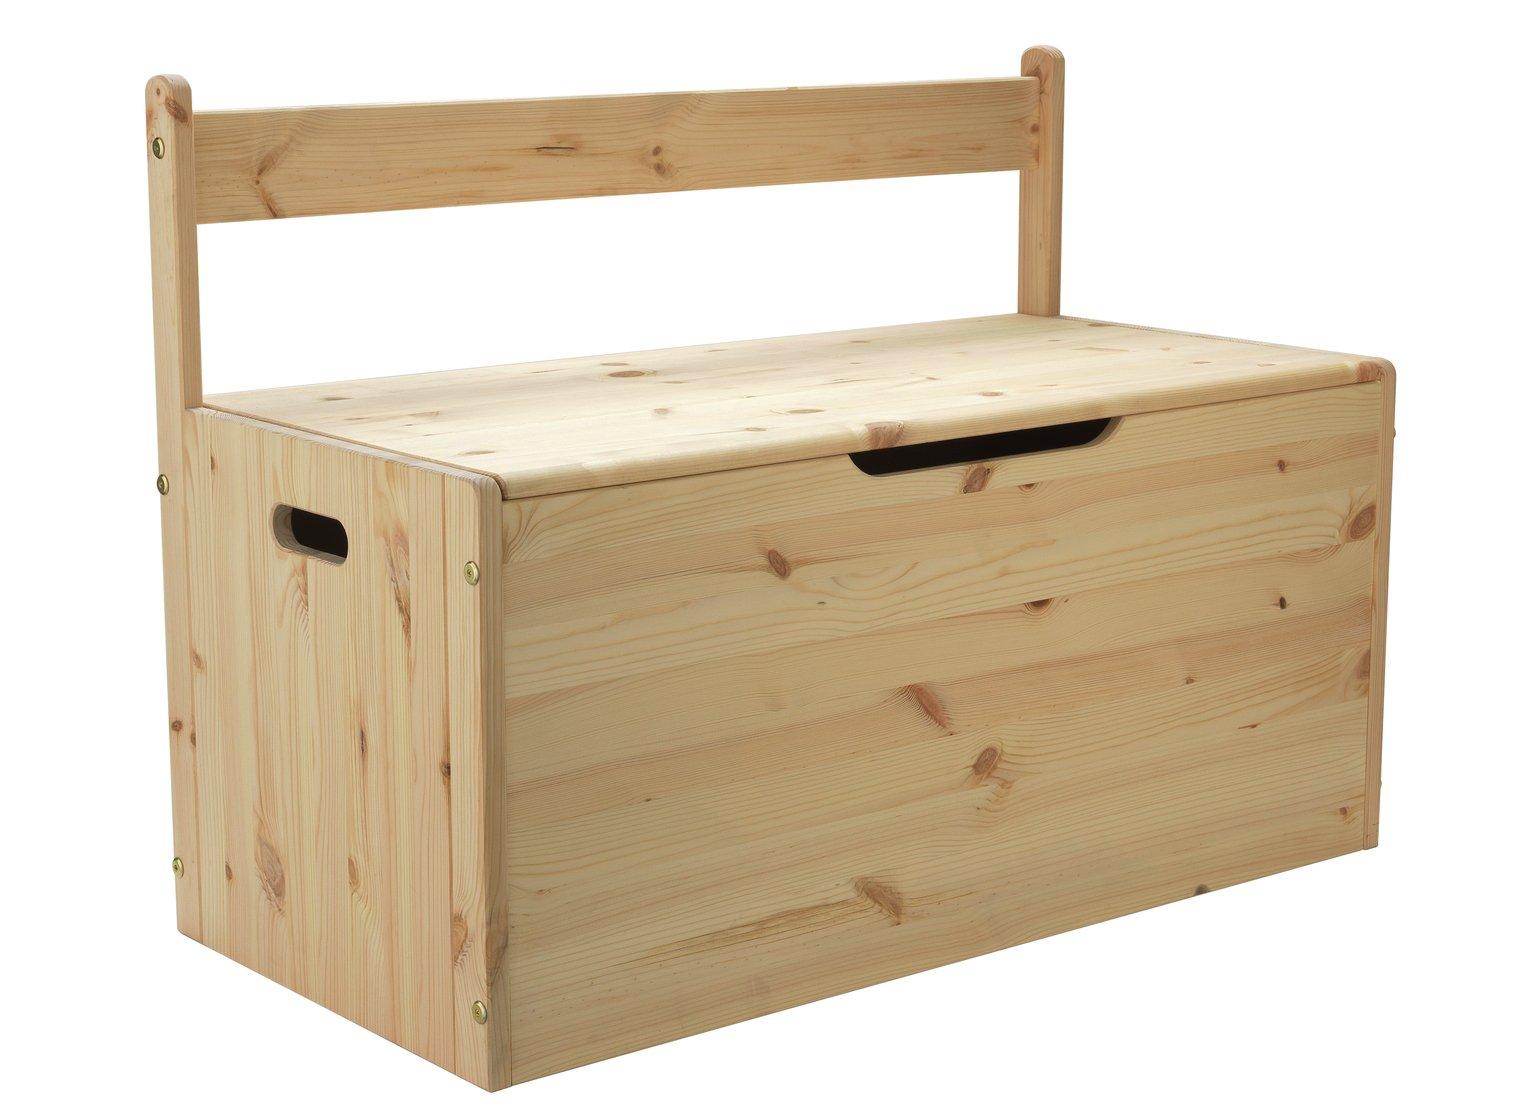 Argos Home Scandinavia Pine Extra Large Toy Box